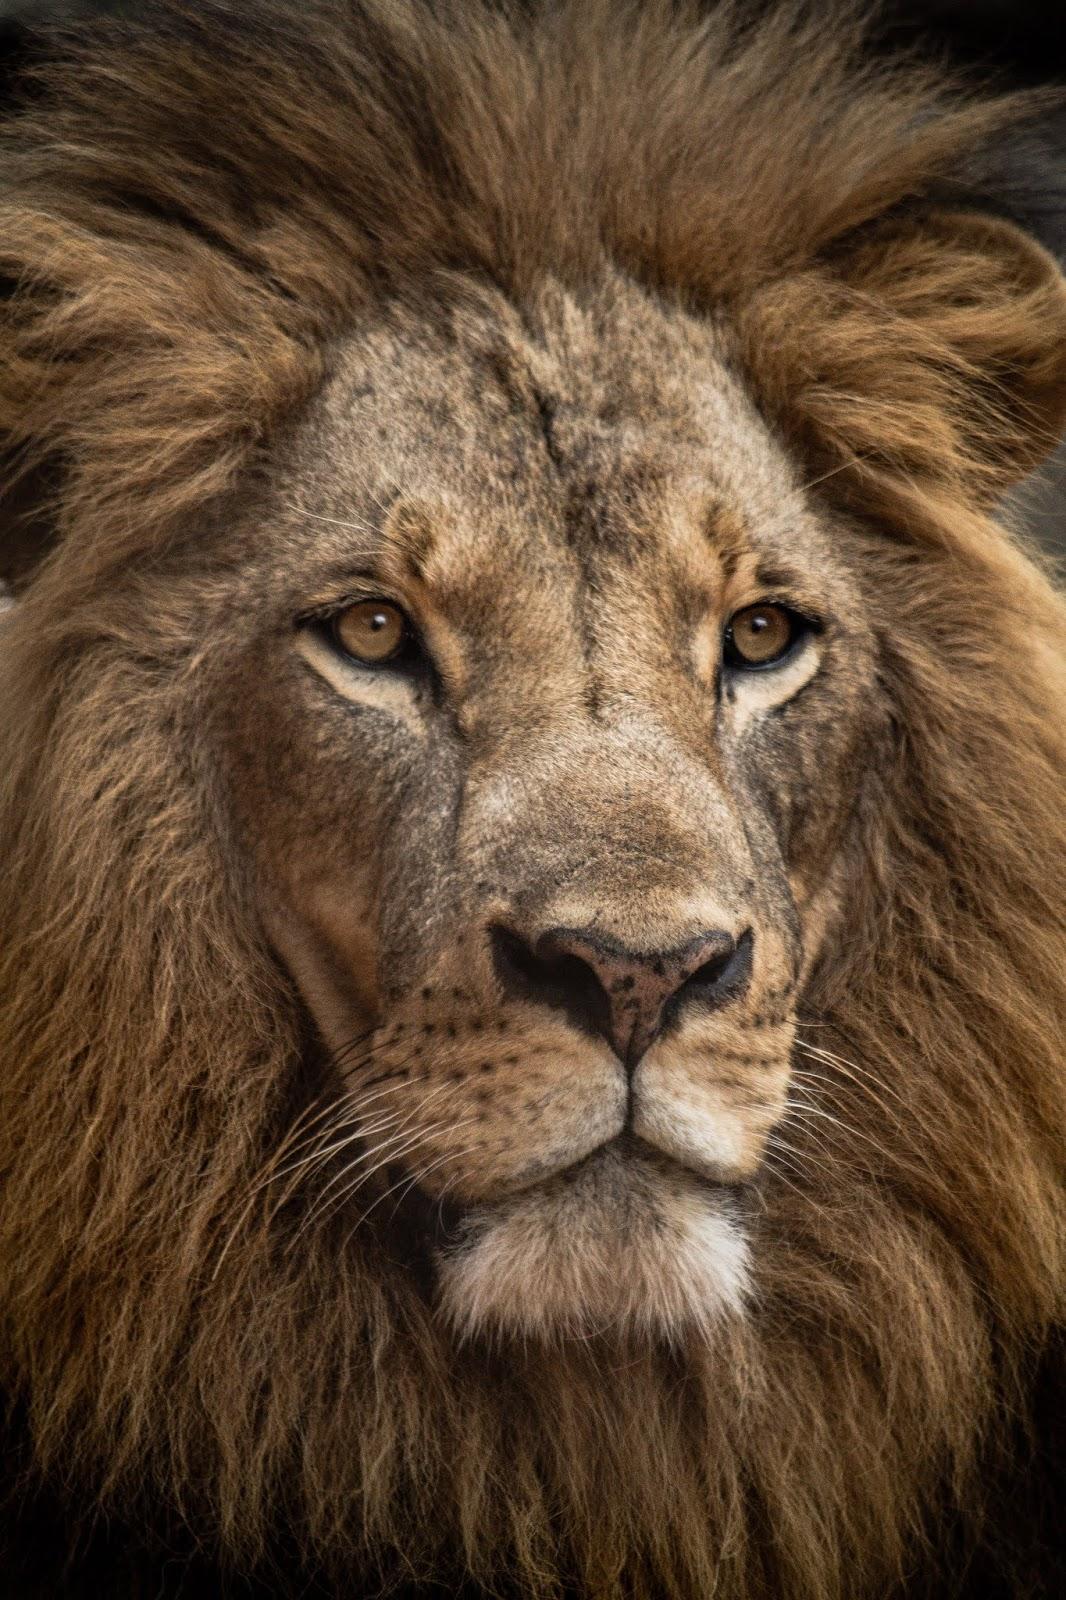 Lion in close-up shot,lion images